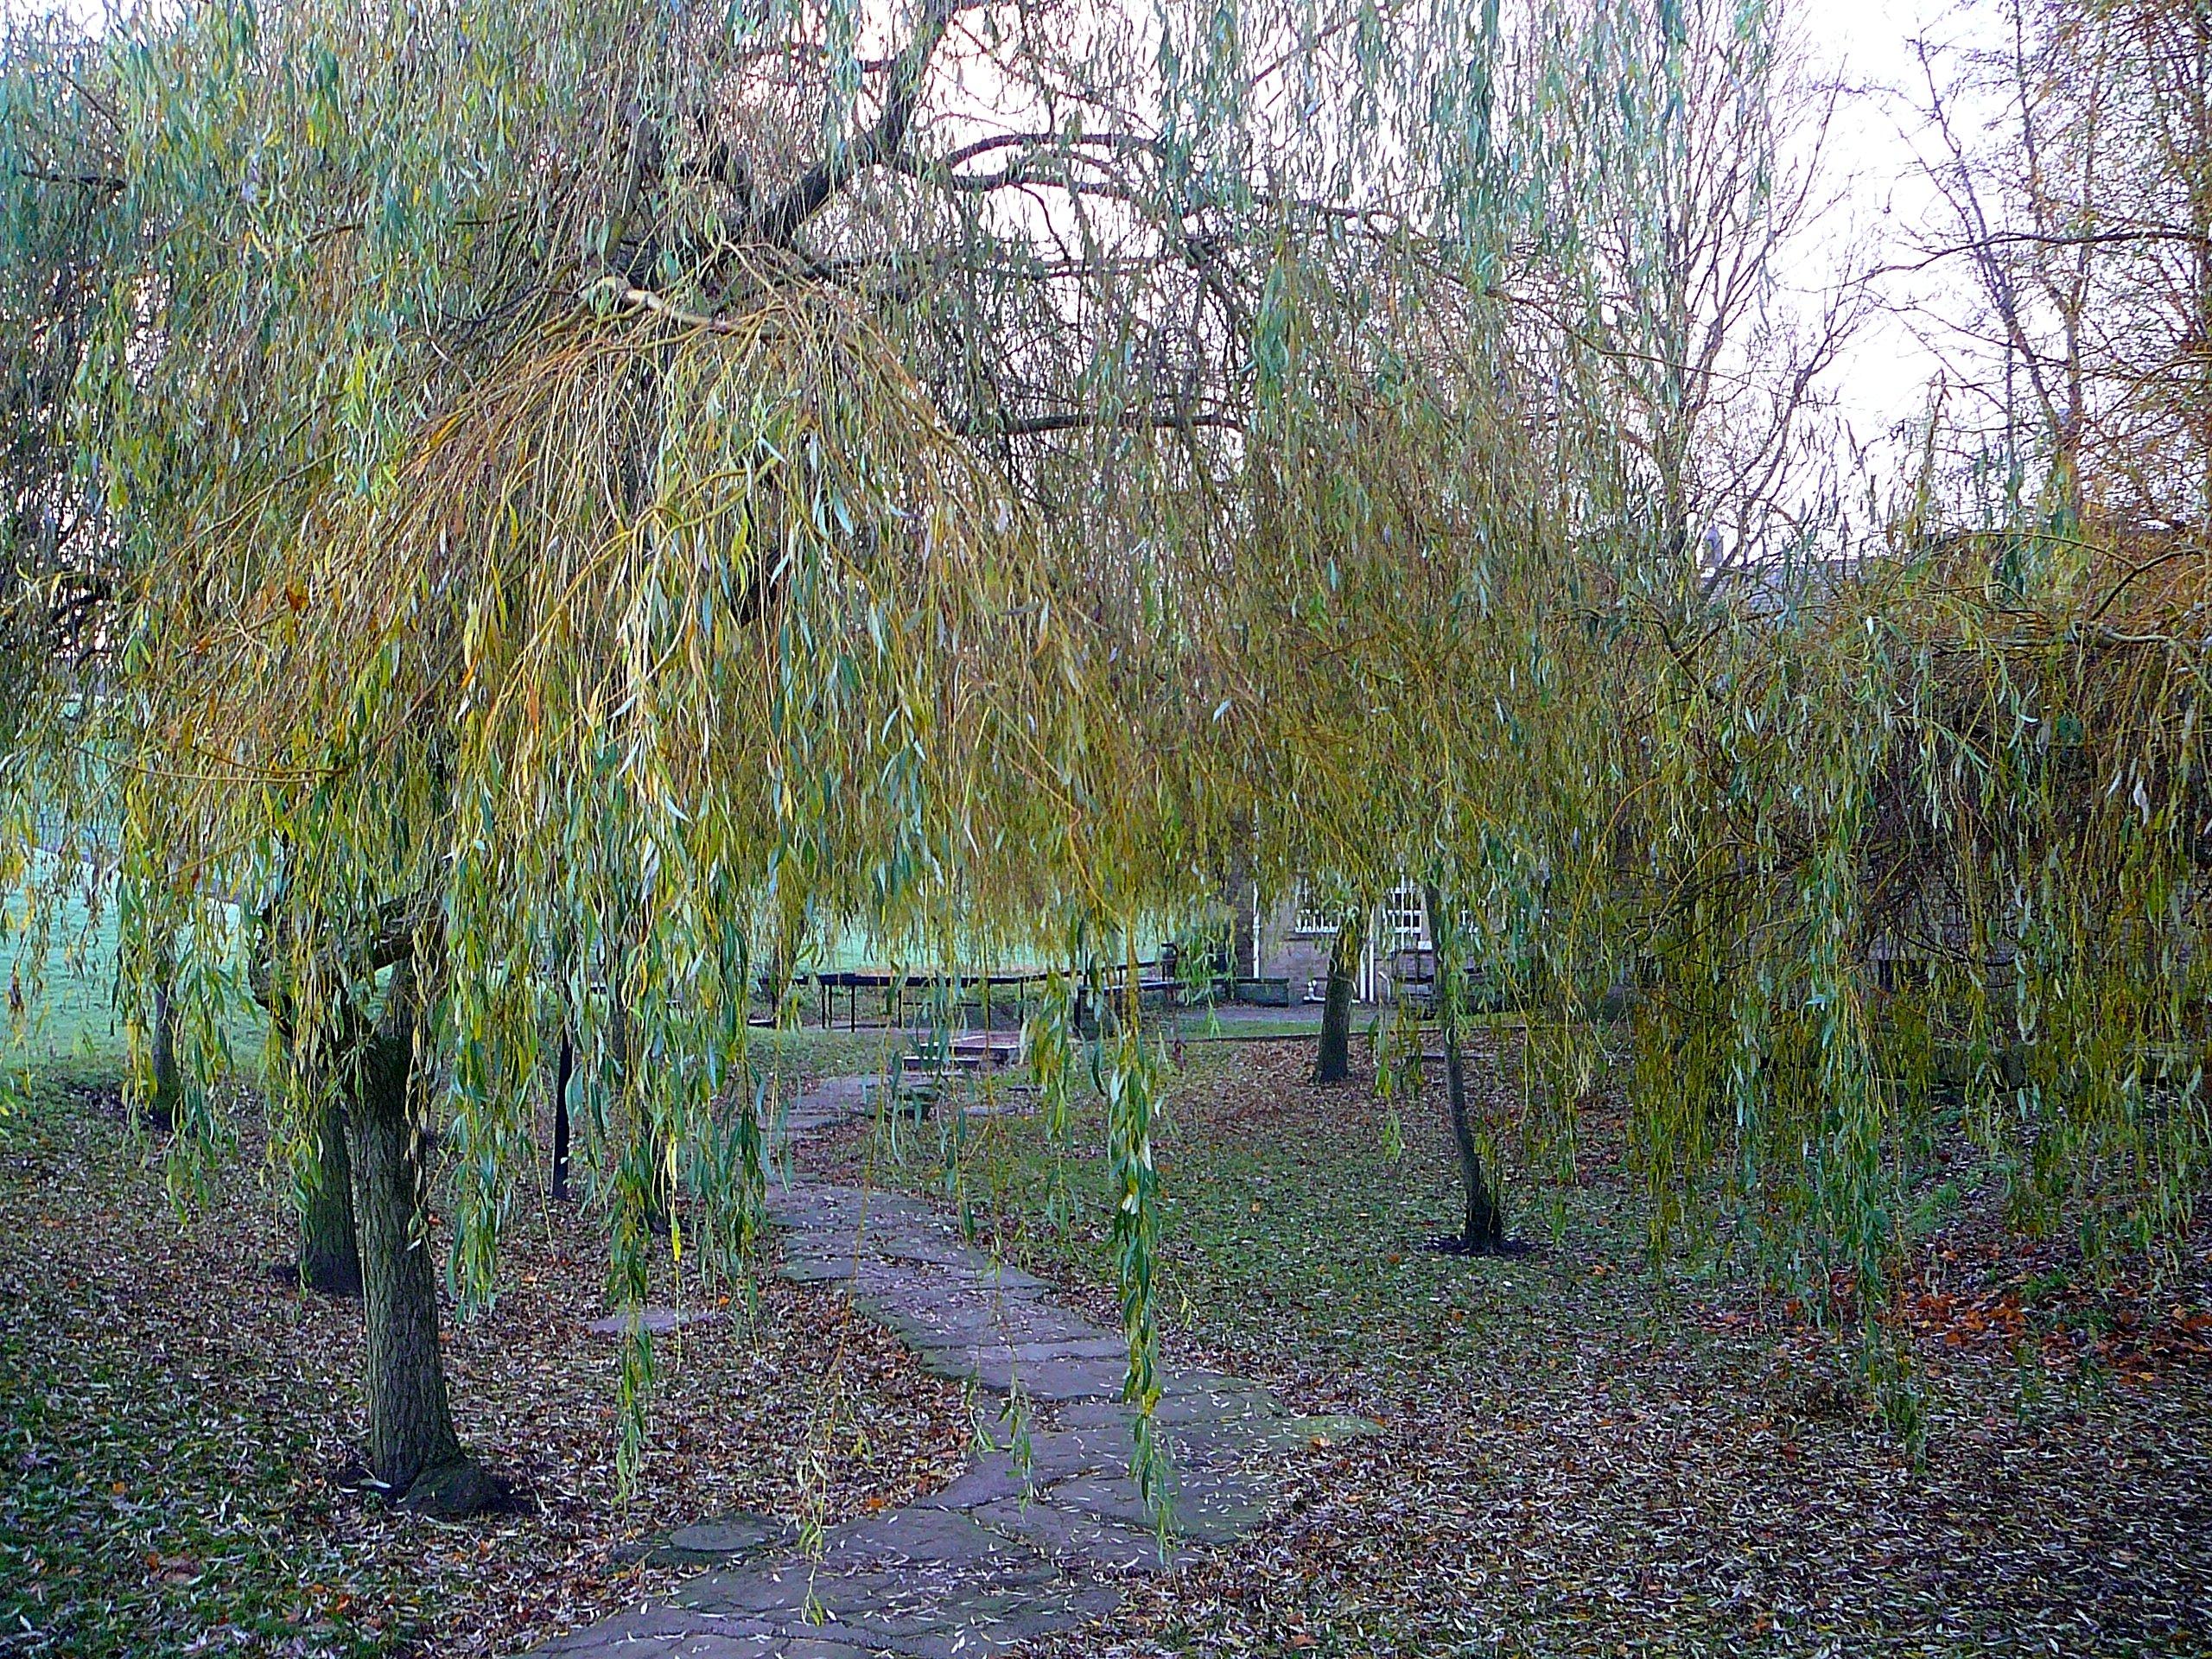 Stone-laid wandering path at Bradford University campus